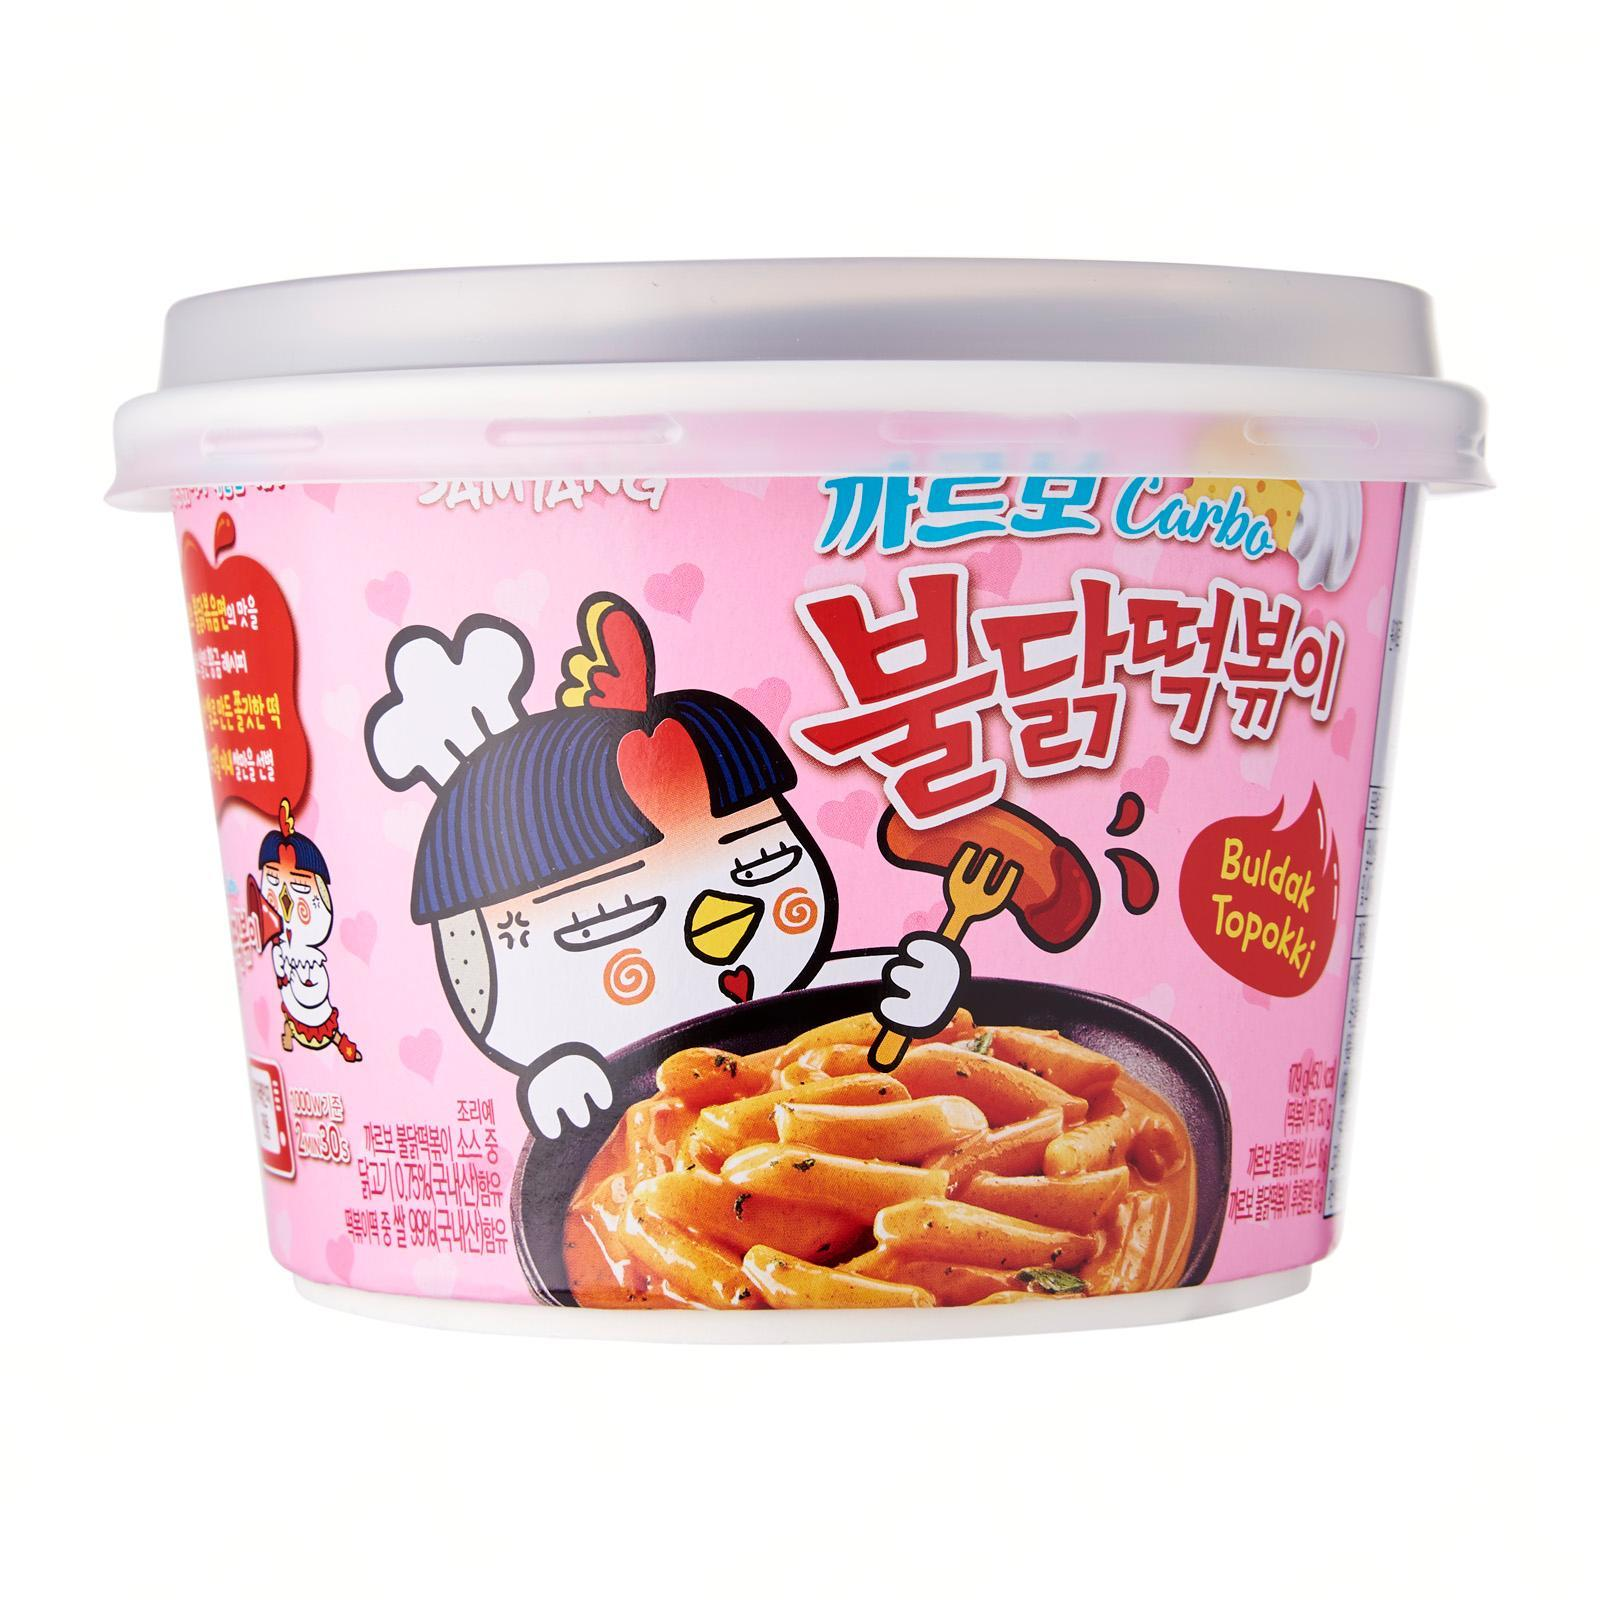 Samyang Hot Chicken Flavor Carbo Topokki 179g